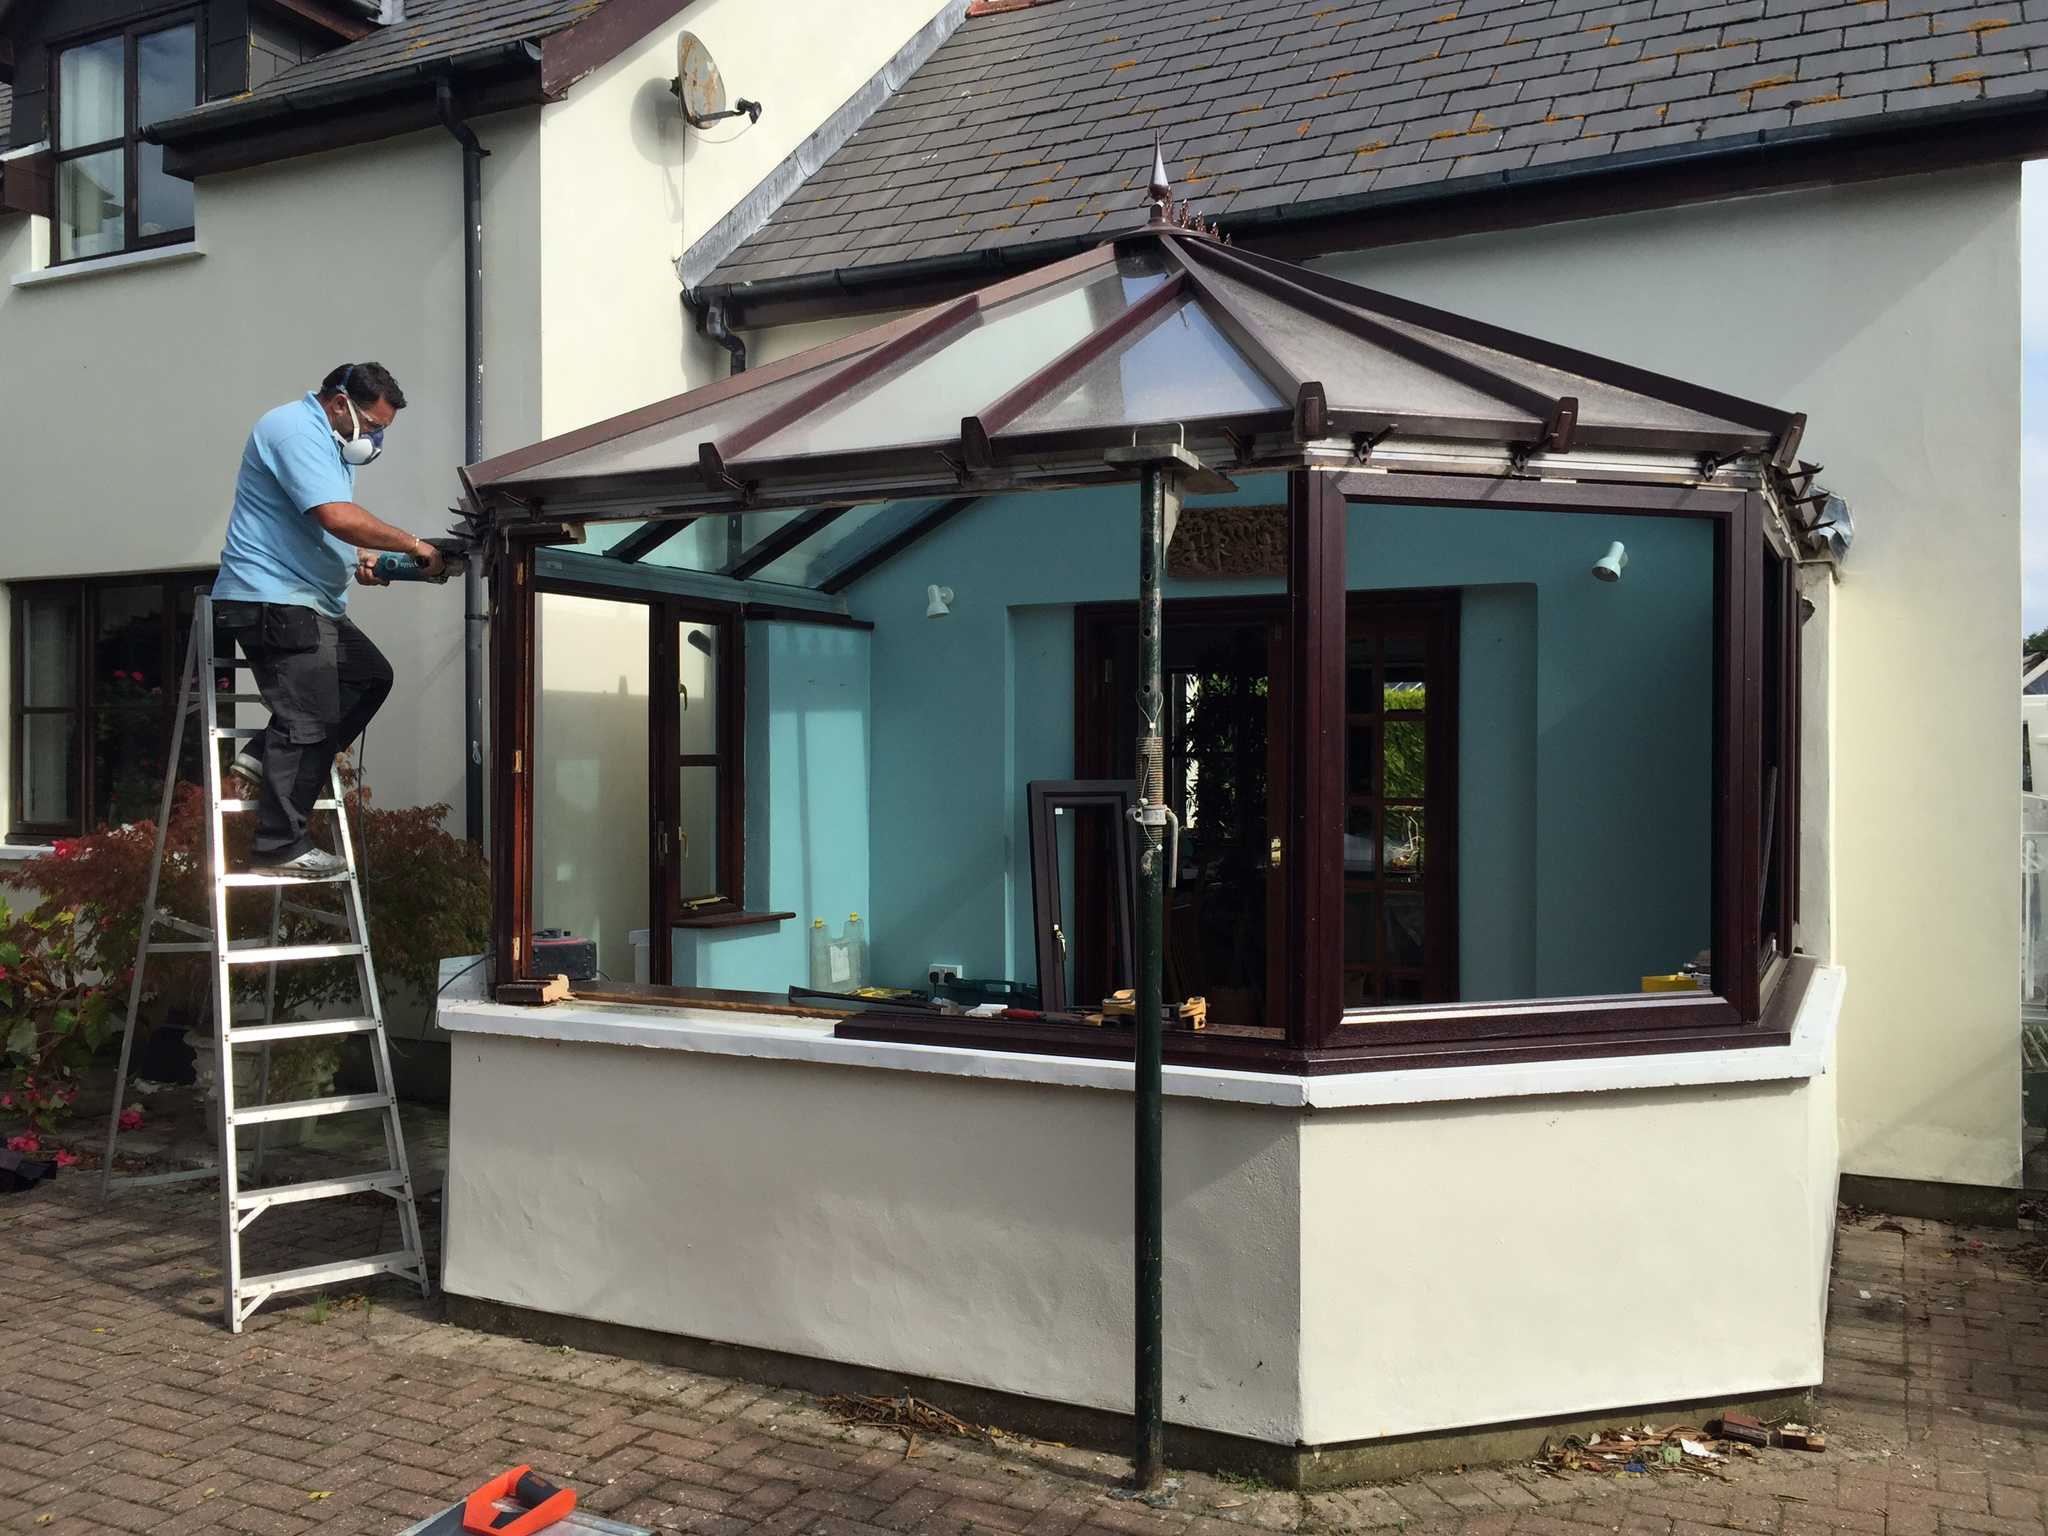 florence shapiro replacement windows - photo#31